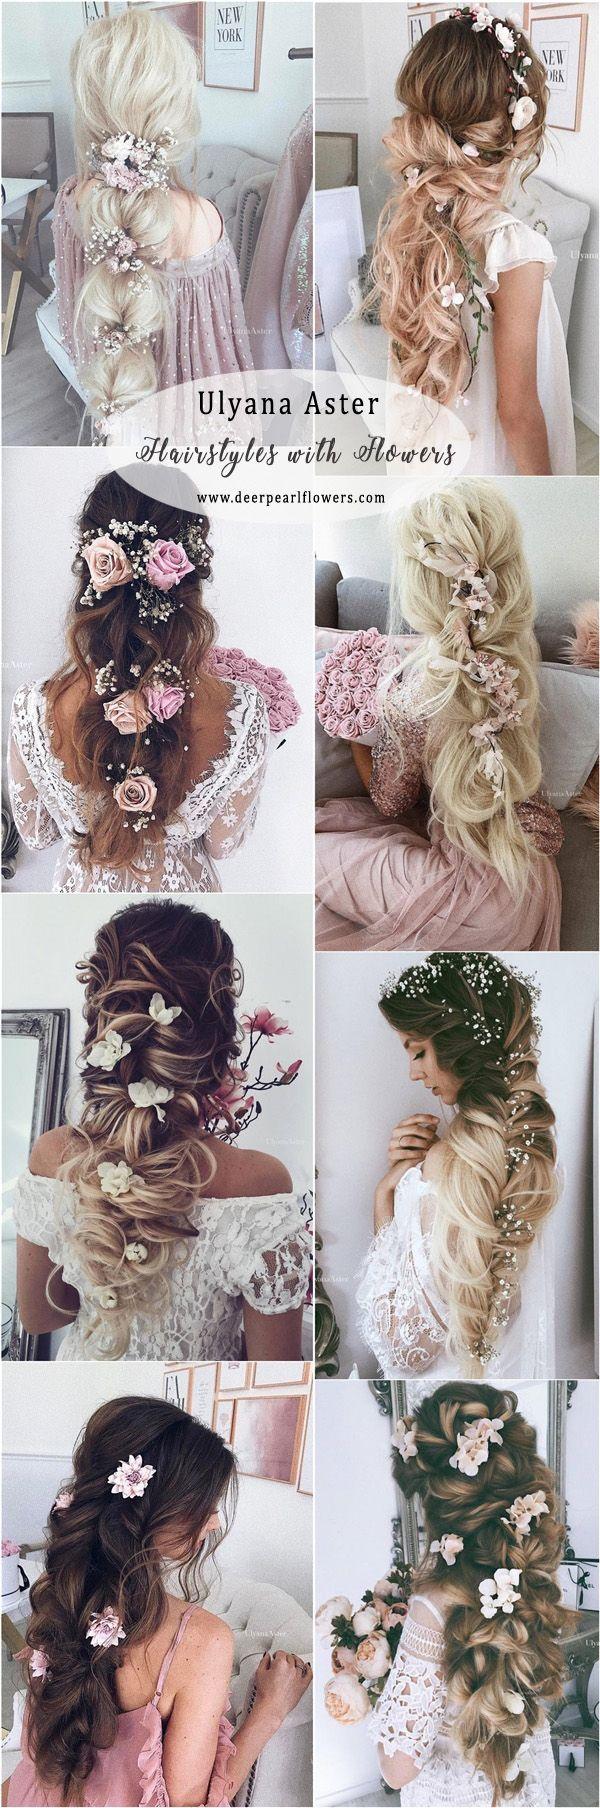 Ulyana Aster Long Wedding Hairstyles with Flowers #weddings #weddingideas #weddnghairstyles #hairstyles   ❤️ http://www.deerpearlflowers.com/ulyana-aster-wedding-hairstyles-2/